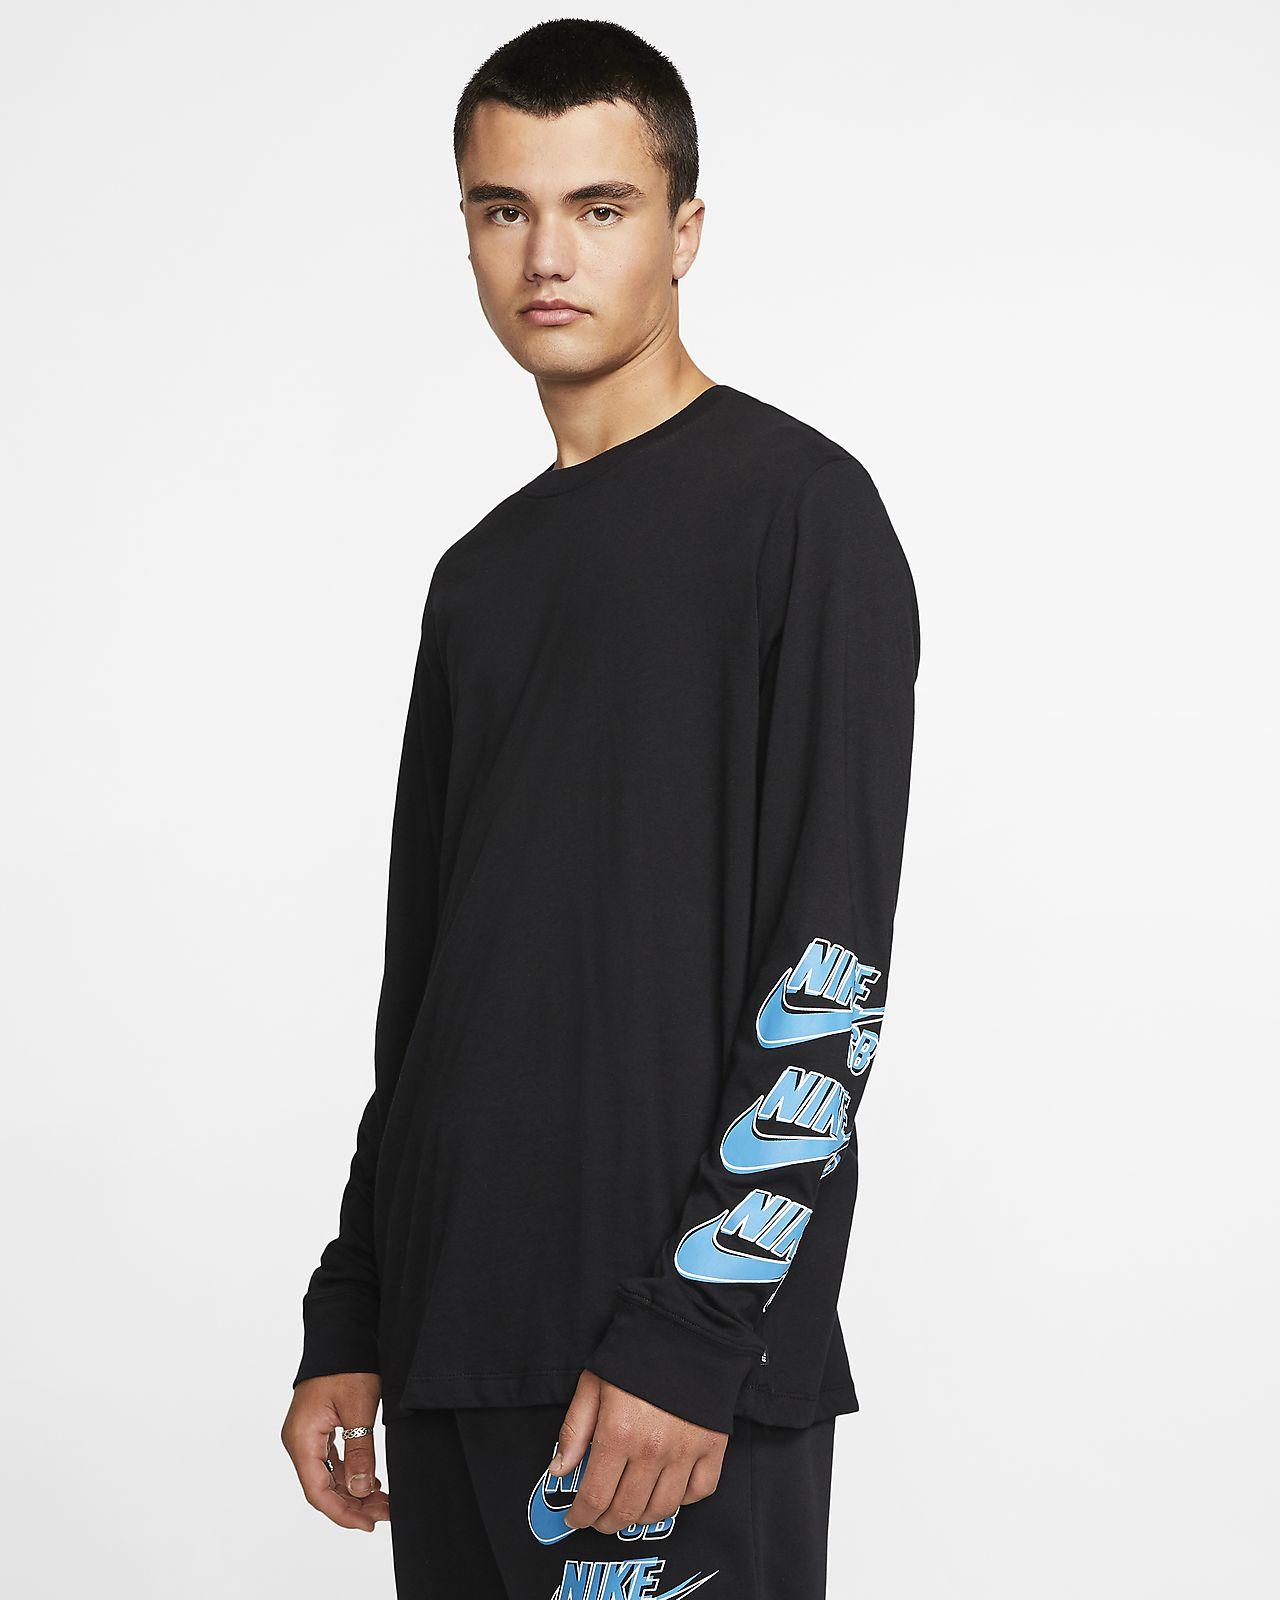 Långärmad t-shirt Nike SB för män